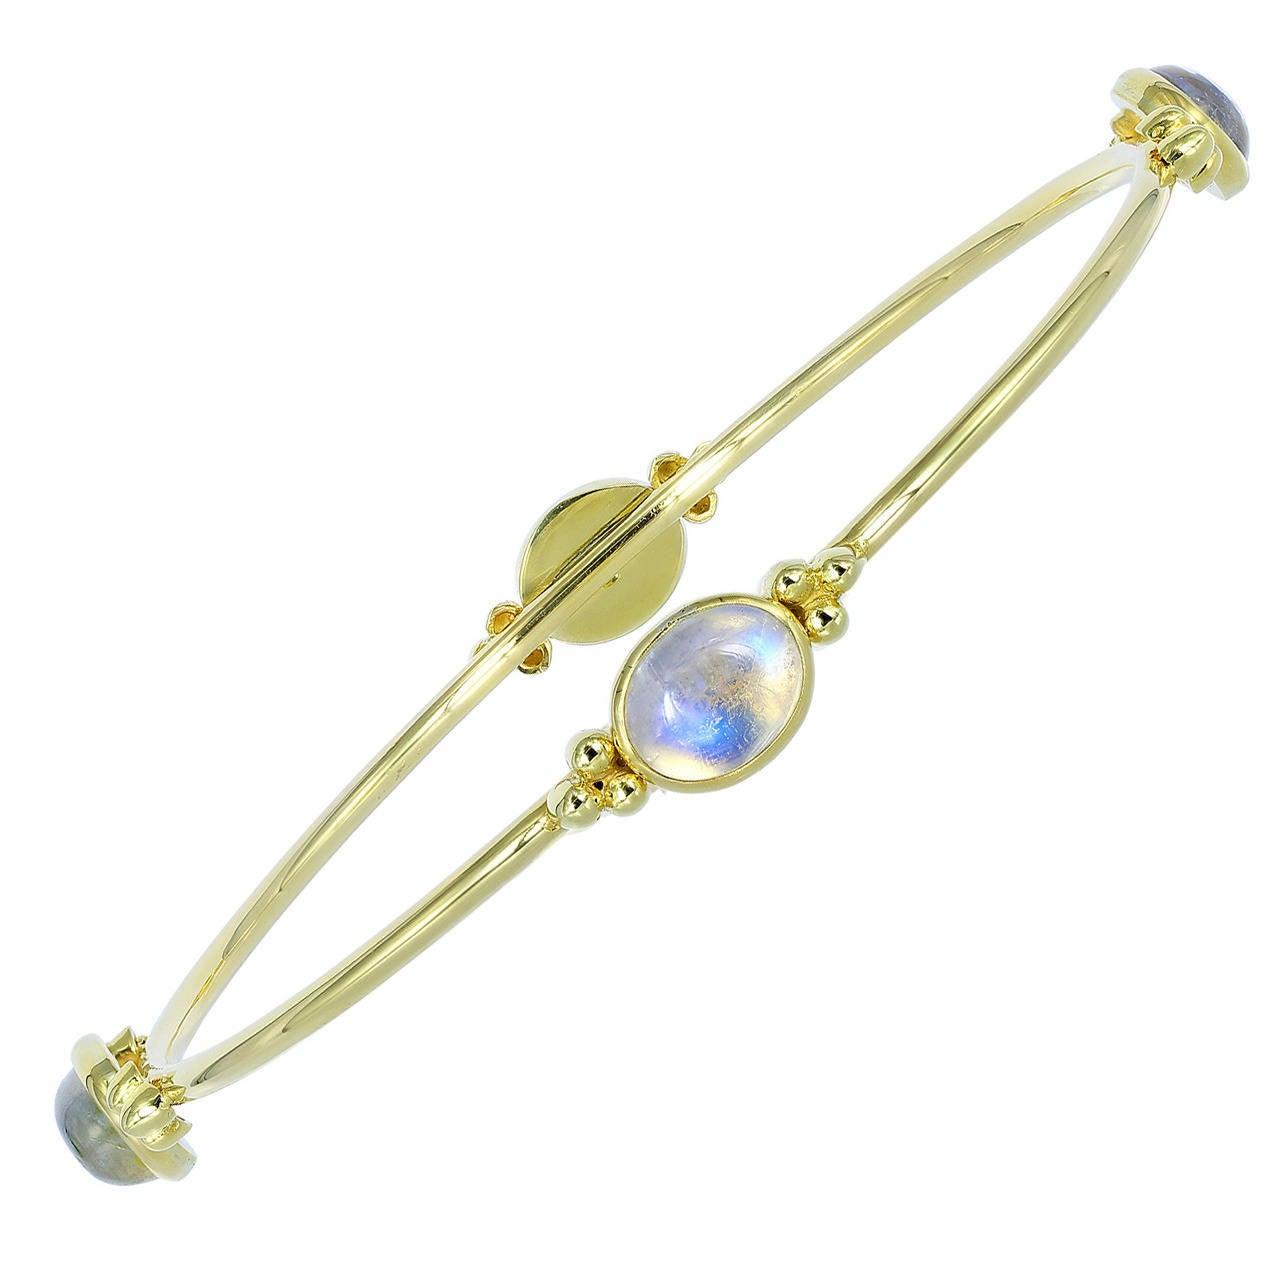 Moonstone and Gold Bangle Bracelet